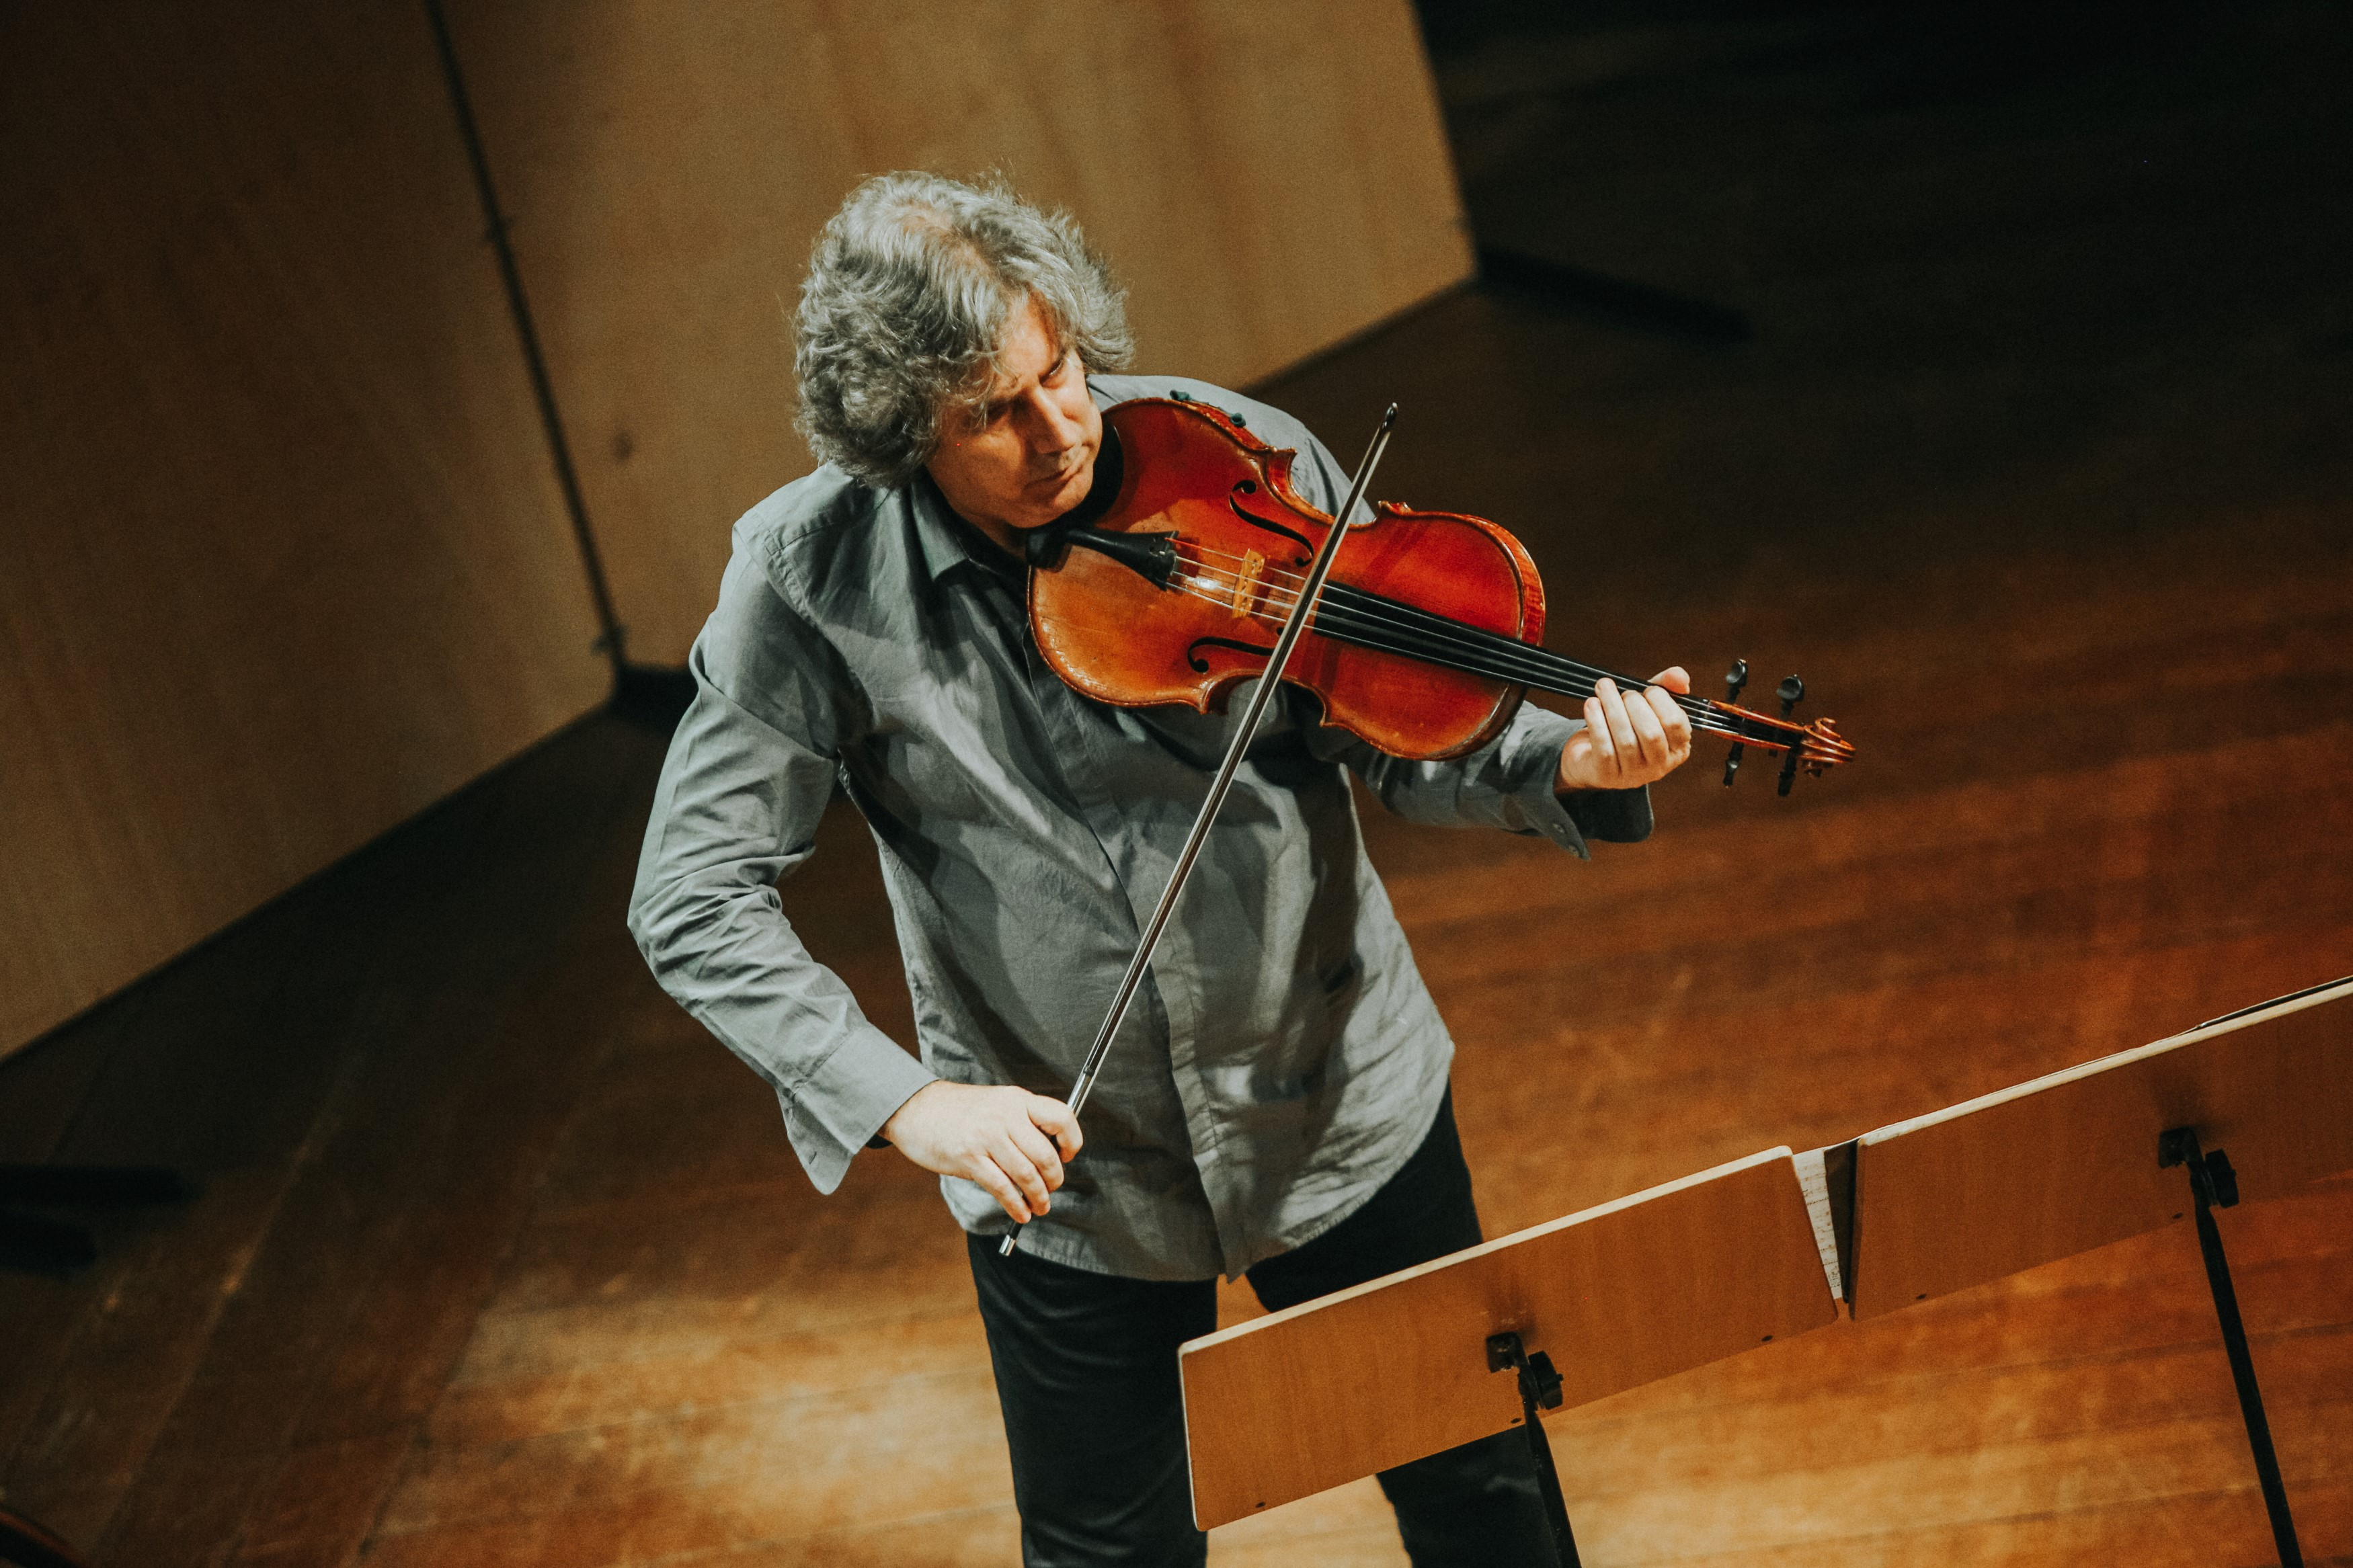 Marcelo Jaffé